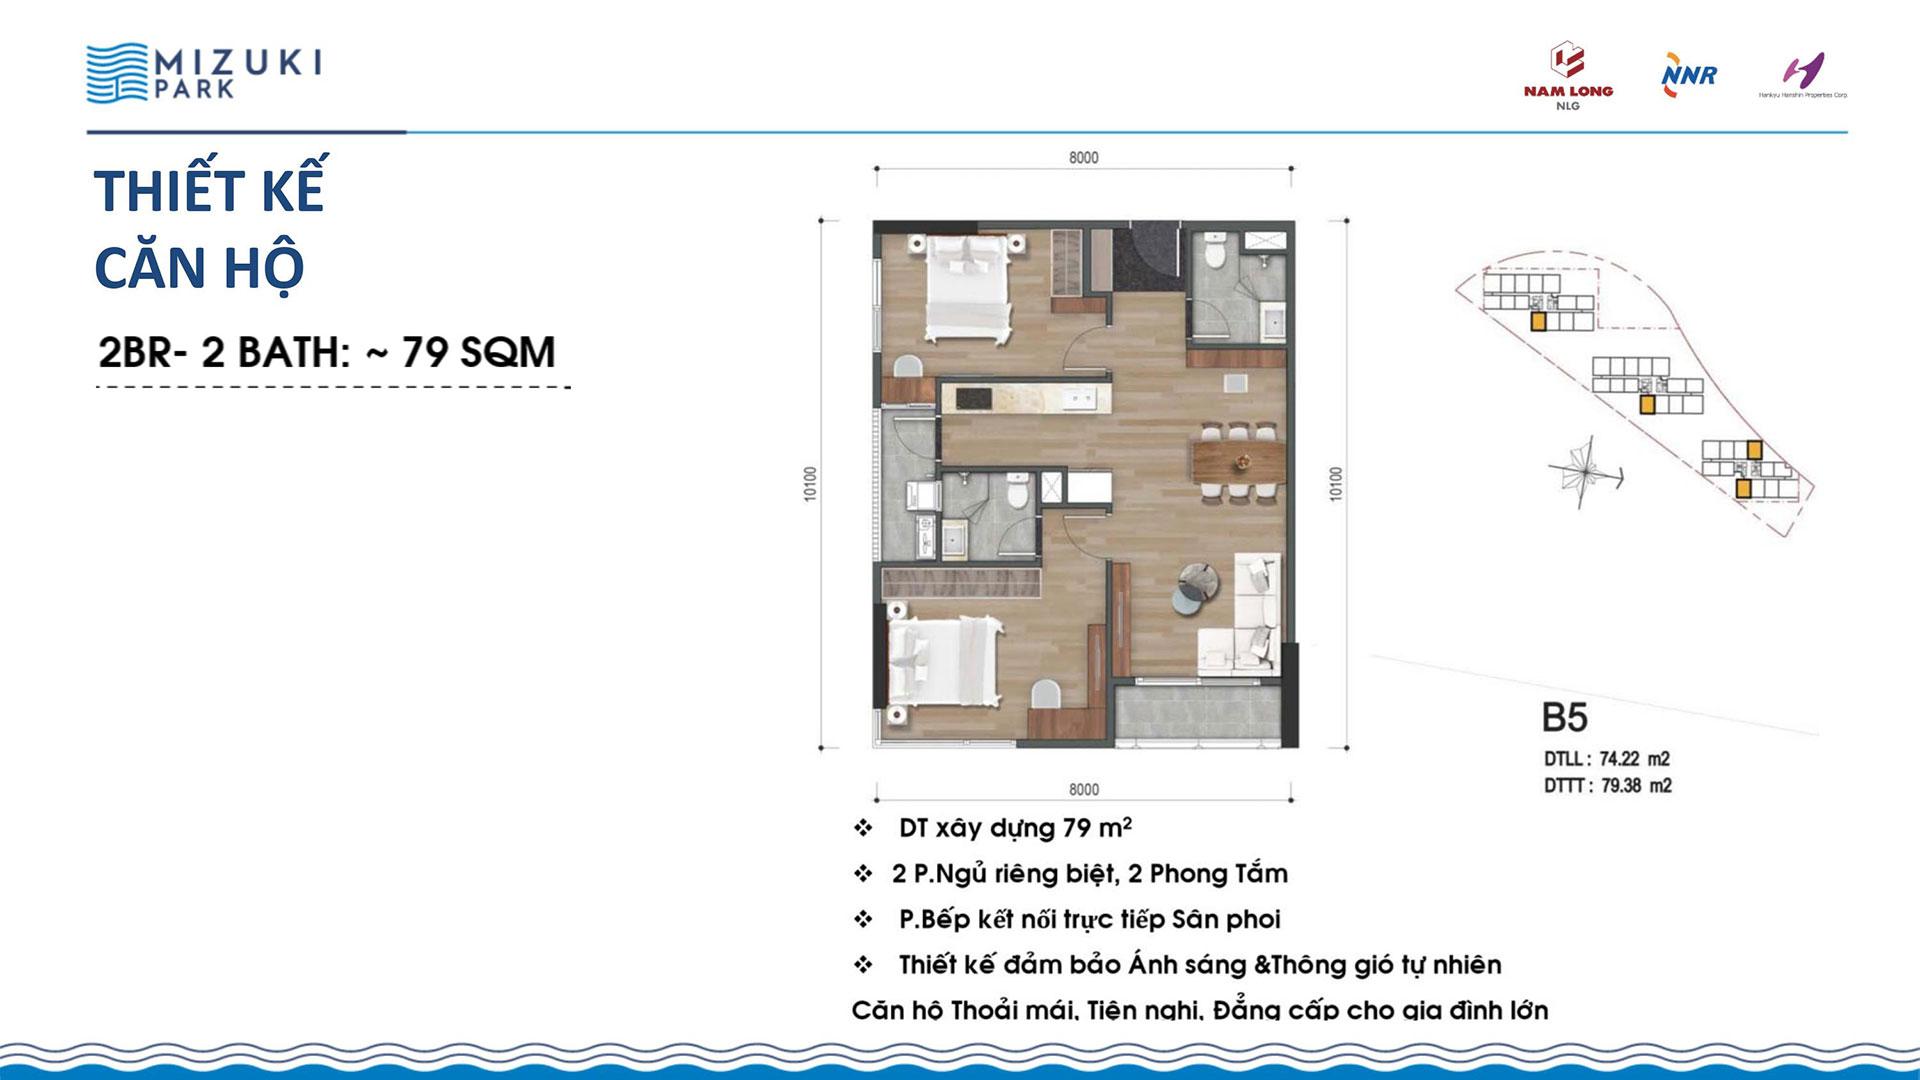 Thiết kế căn hộ Mizuki Park 79m2